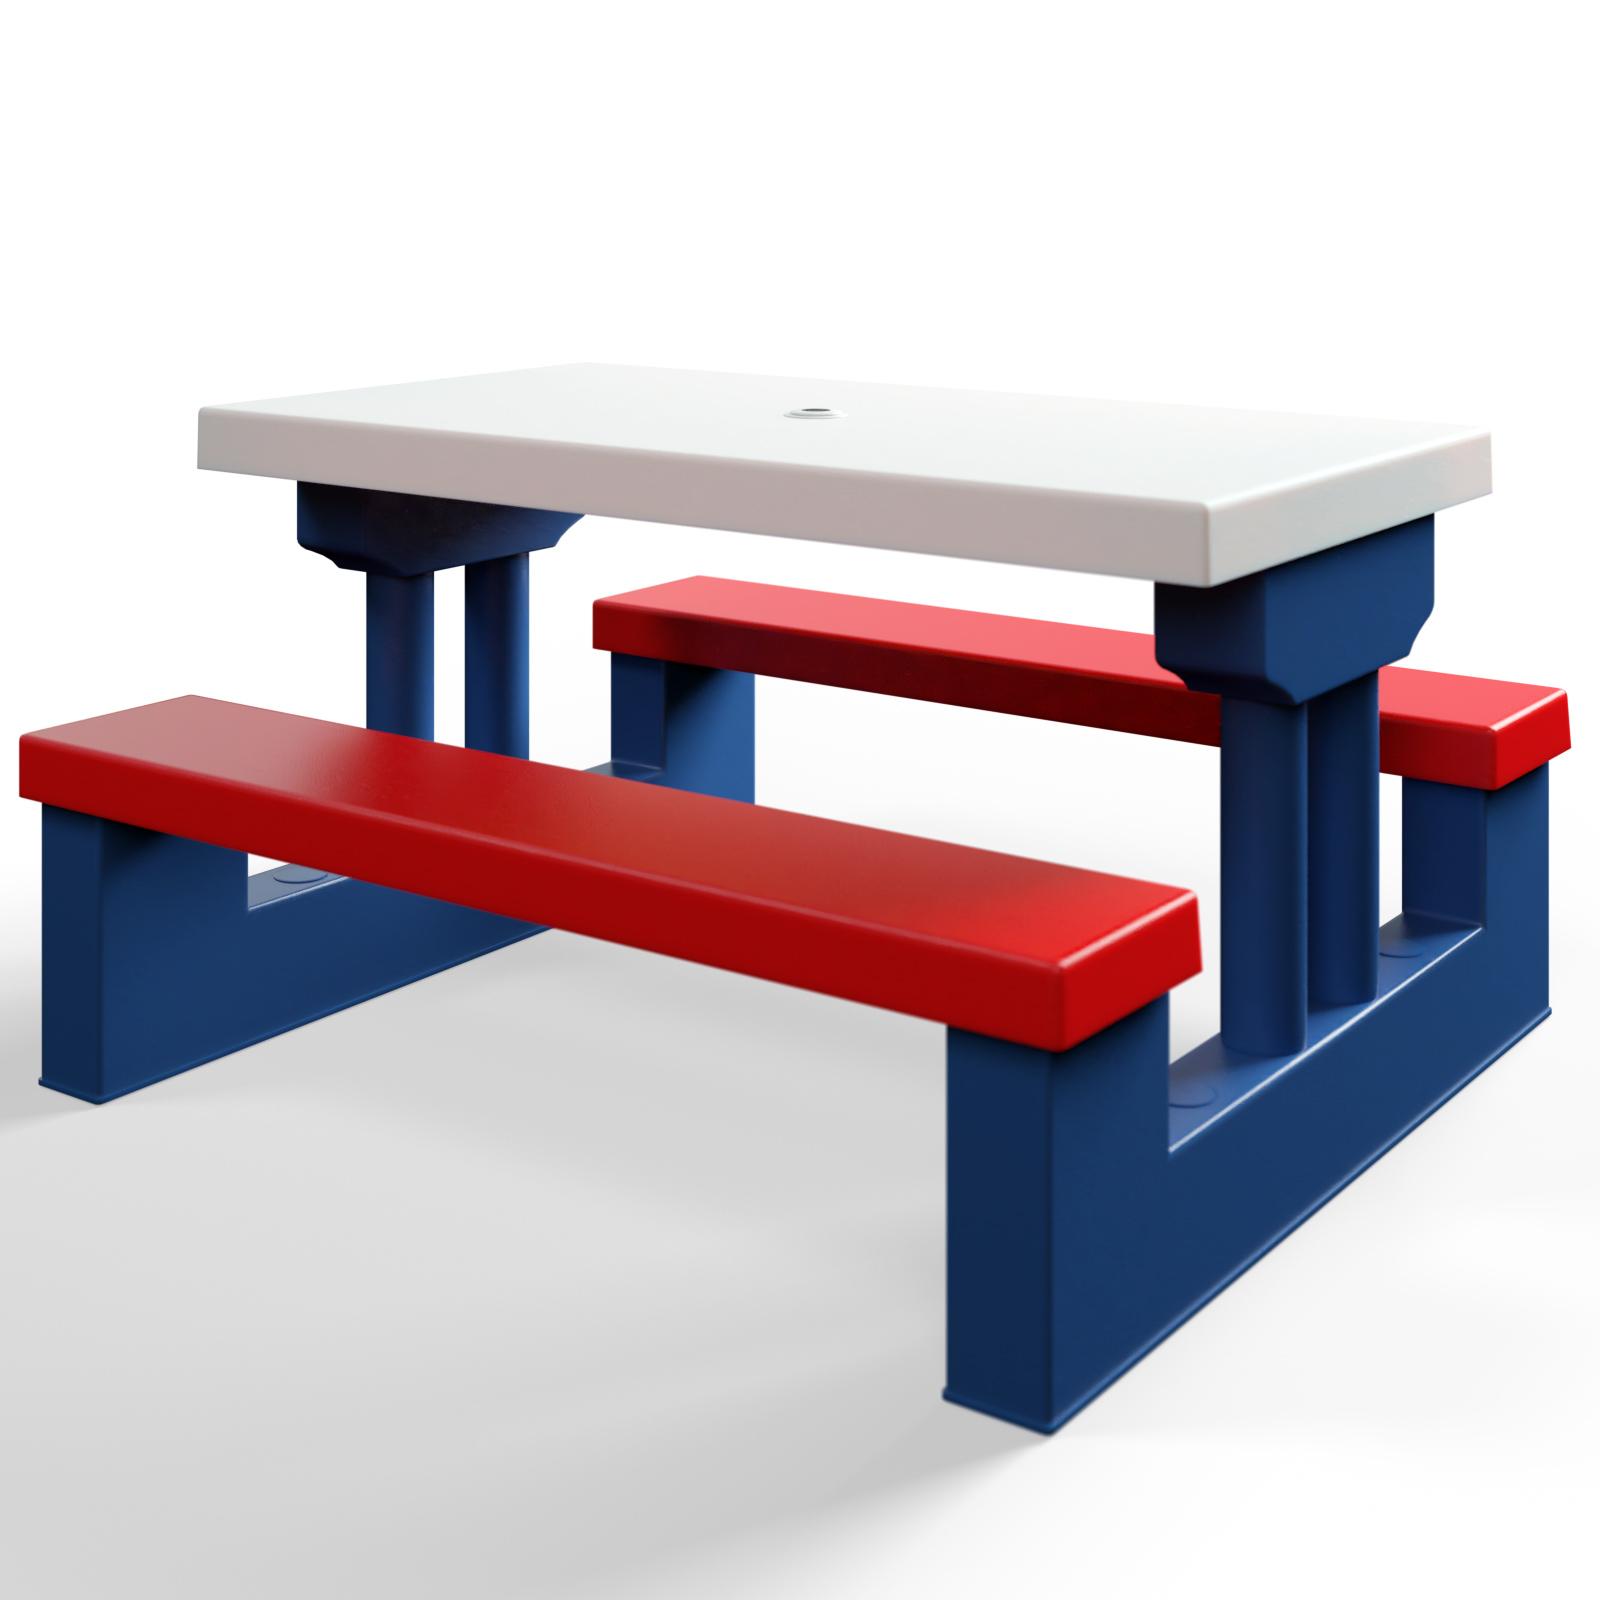 kindersitzgruppe sitzgarnitur kinder kinderm bel garten tisch bank sonnenschirm ebay. Black Bedroom Furniture Sets. Home Design Ideas